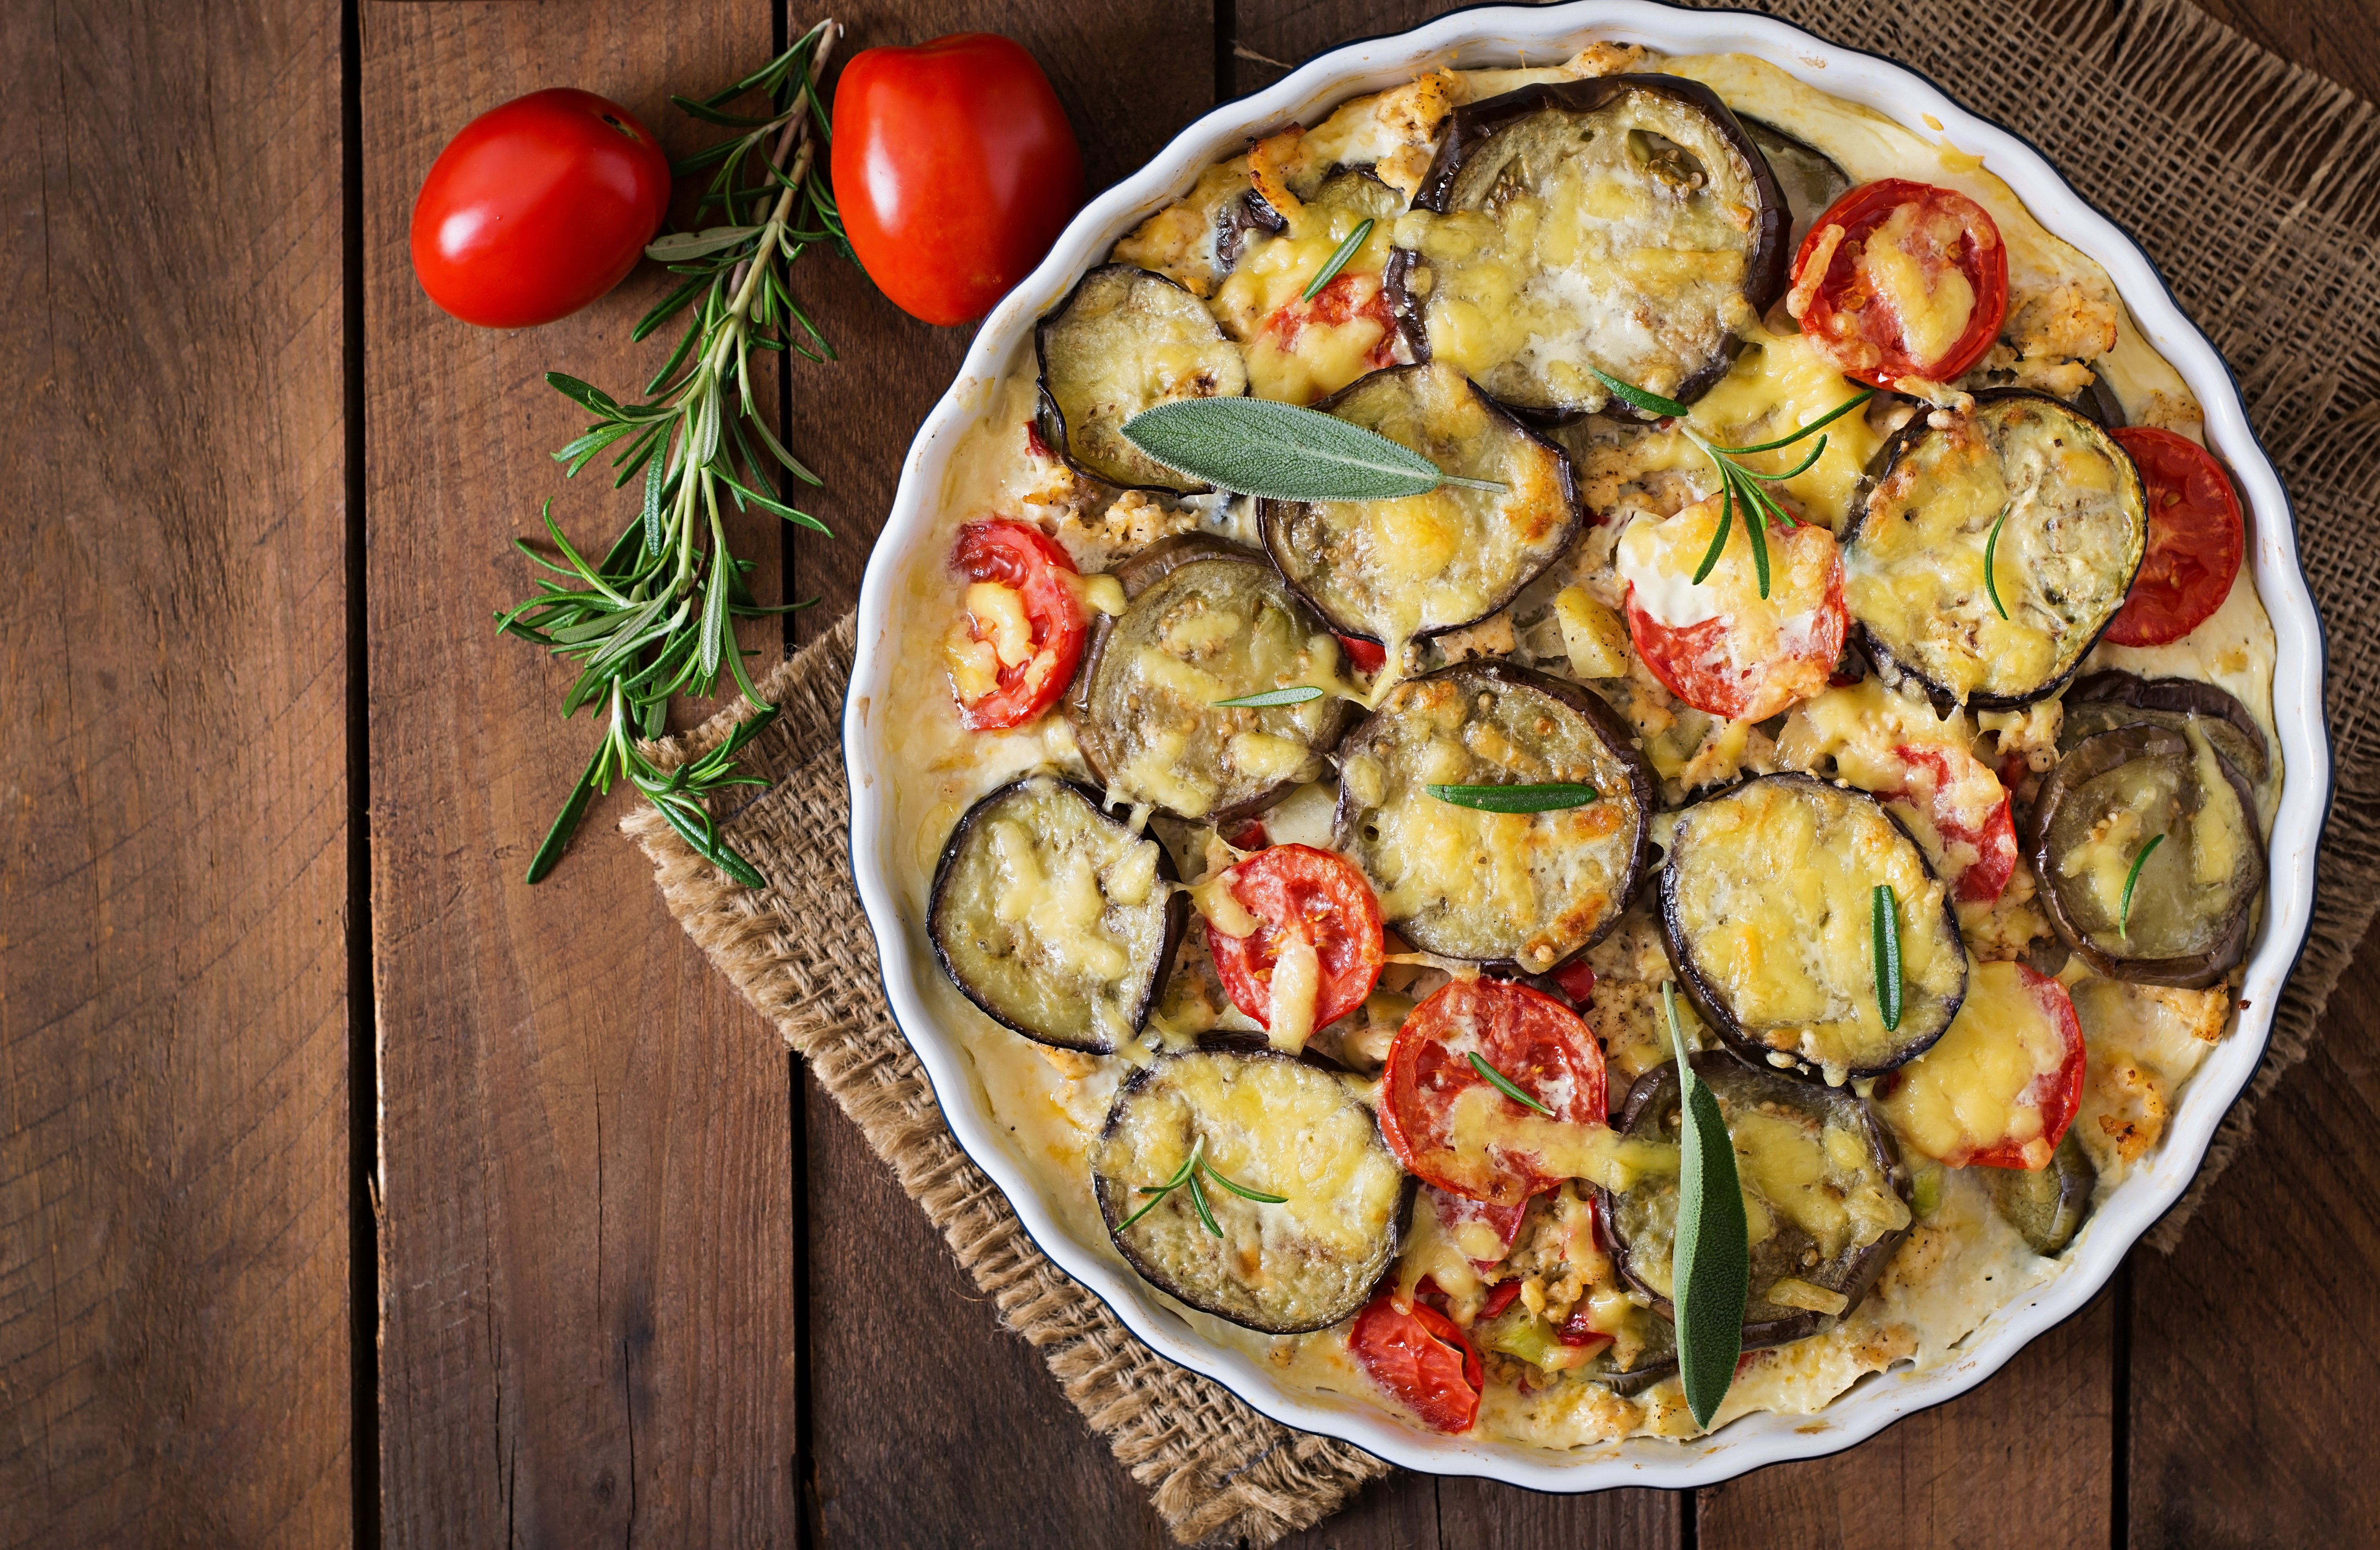 5 Delicious Ways to Cook Eggplant — That Aren't Eggplant Parm